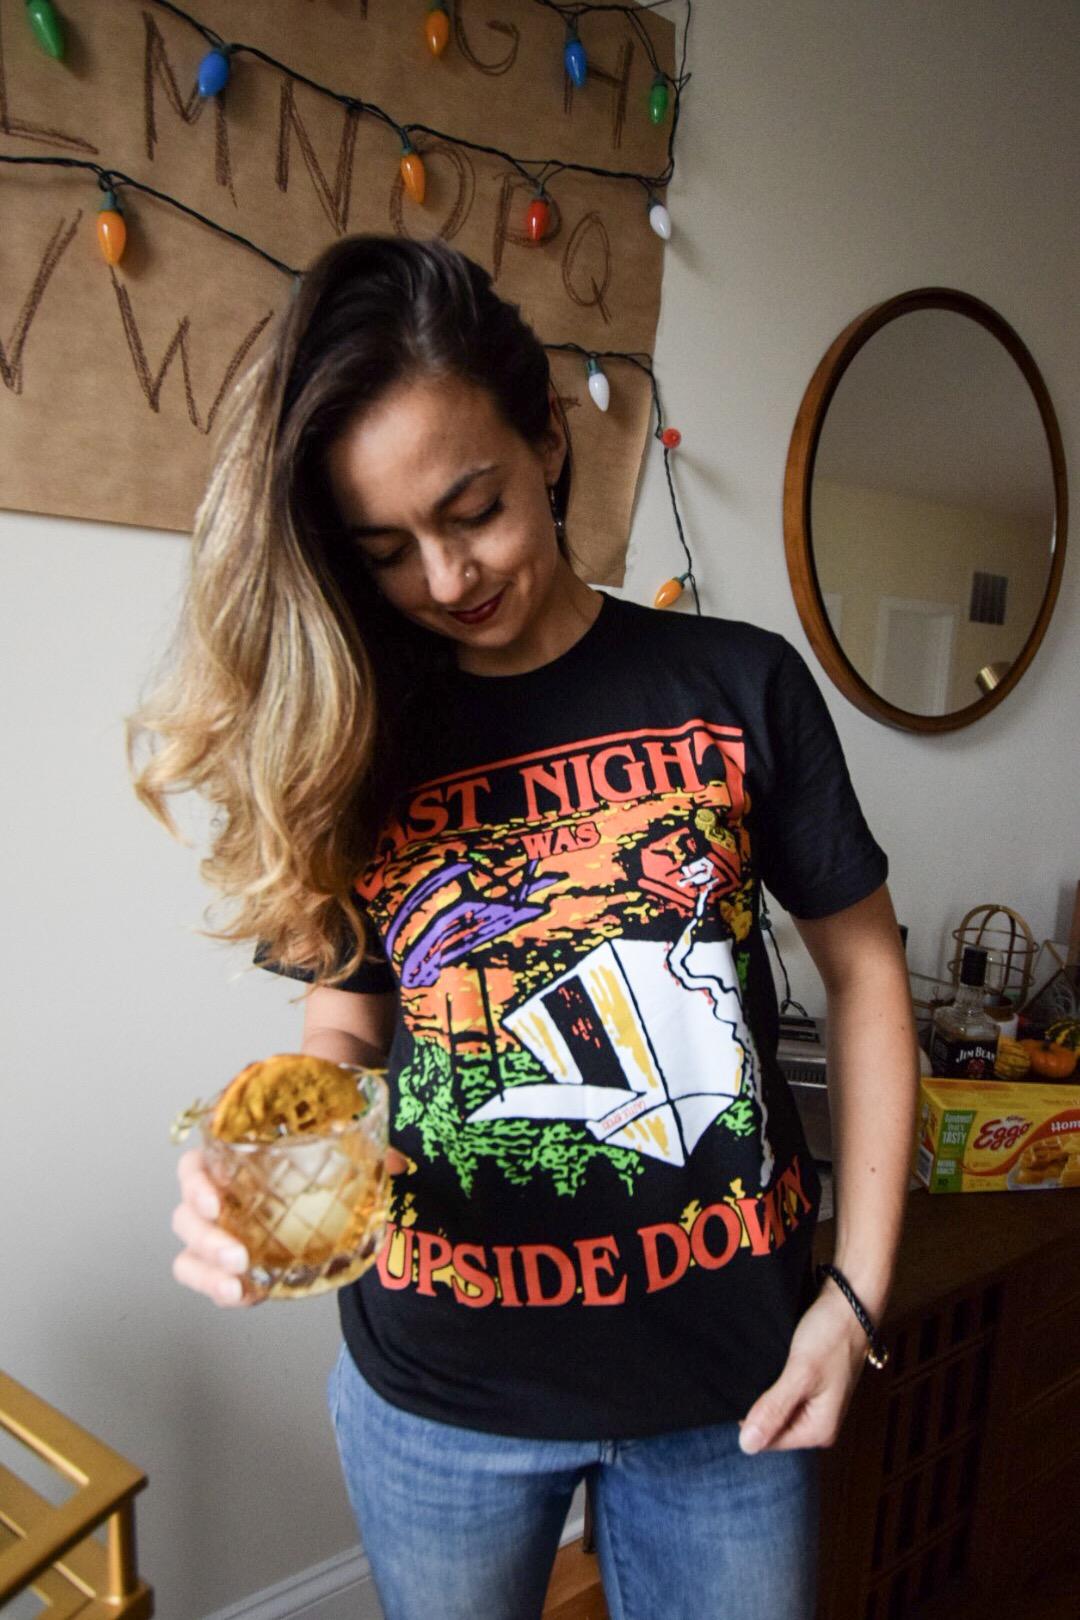 stranger-things-t-shirt-indy-brand